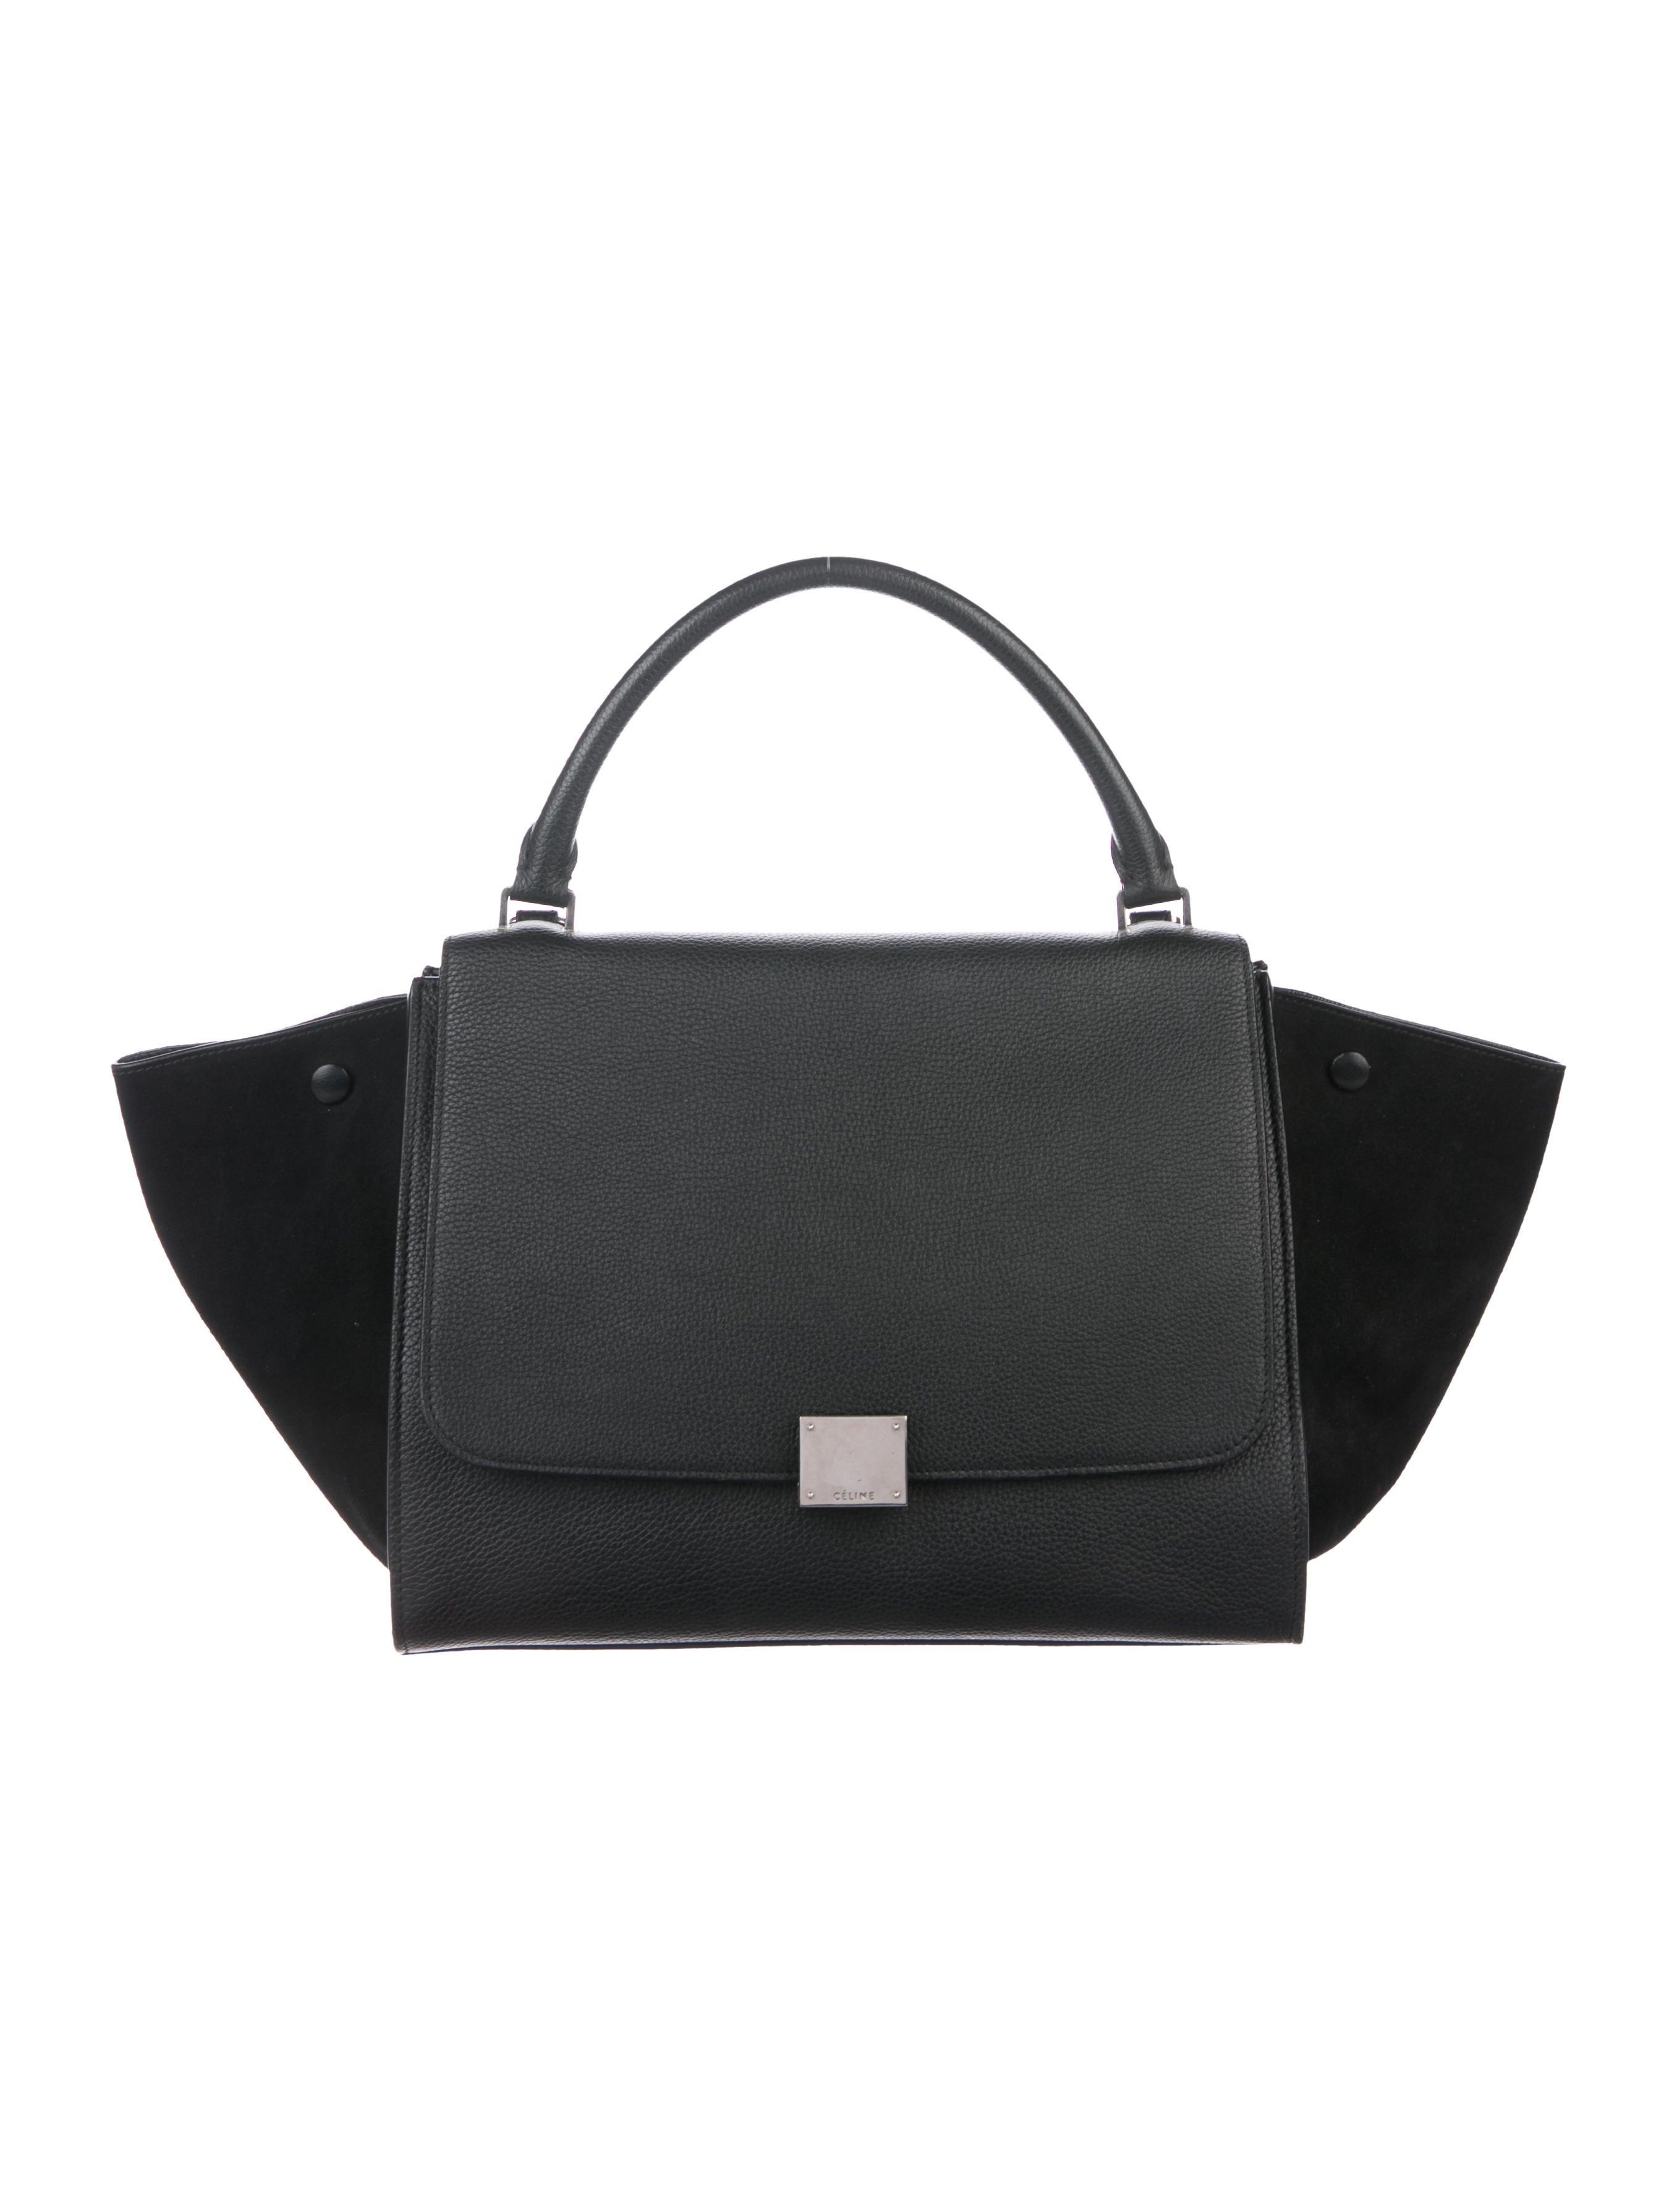 a9a5630097bd Celine Céline Medium Trapeze Bag - Handbags - CEL85711